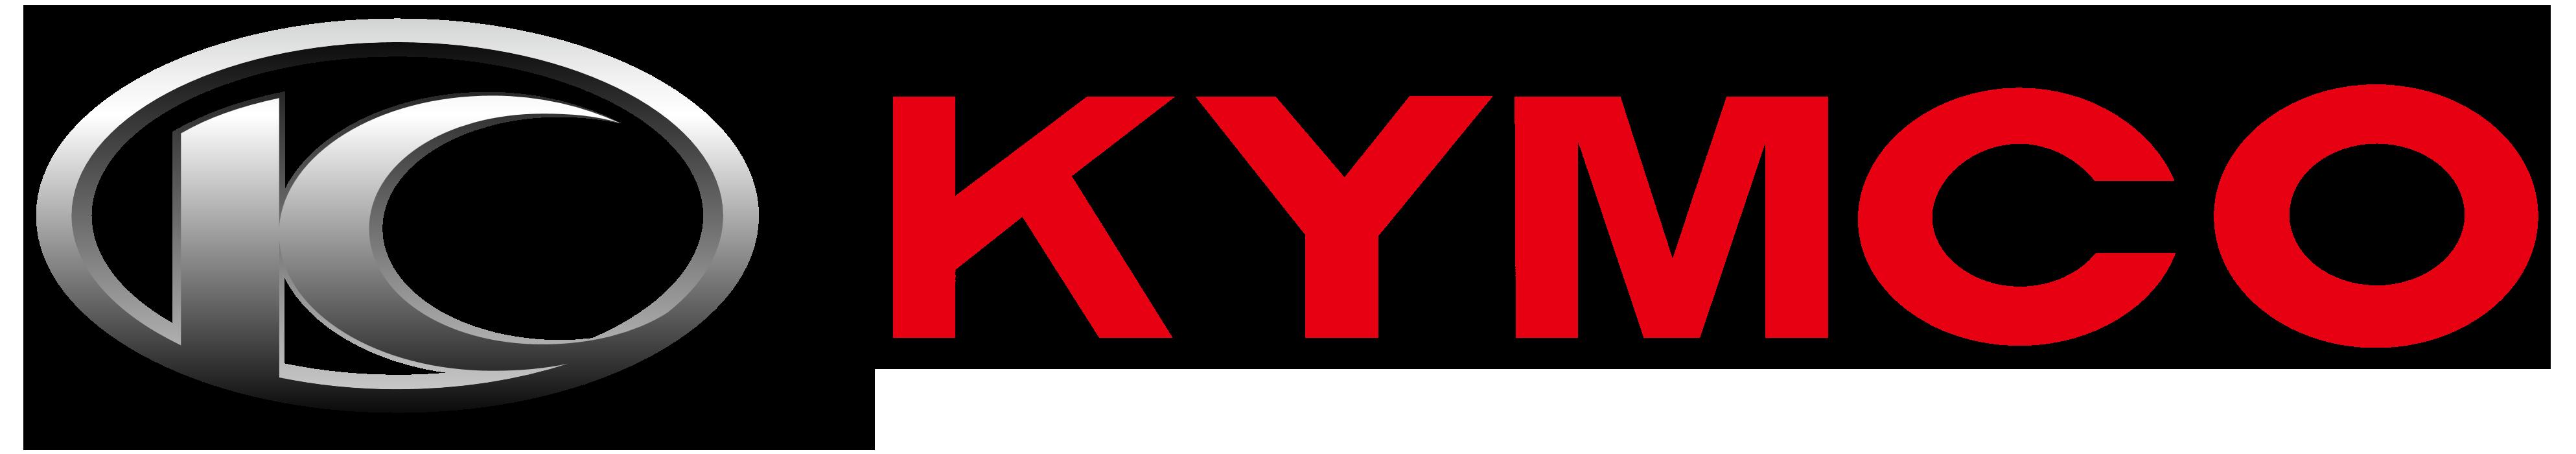 Télephone information entreprise  Kymco